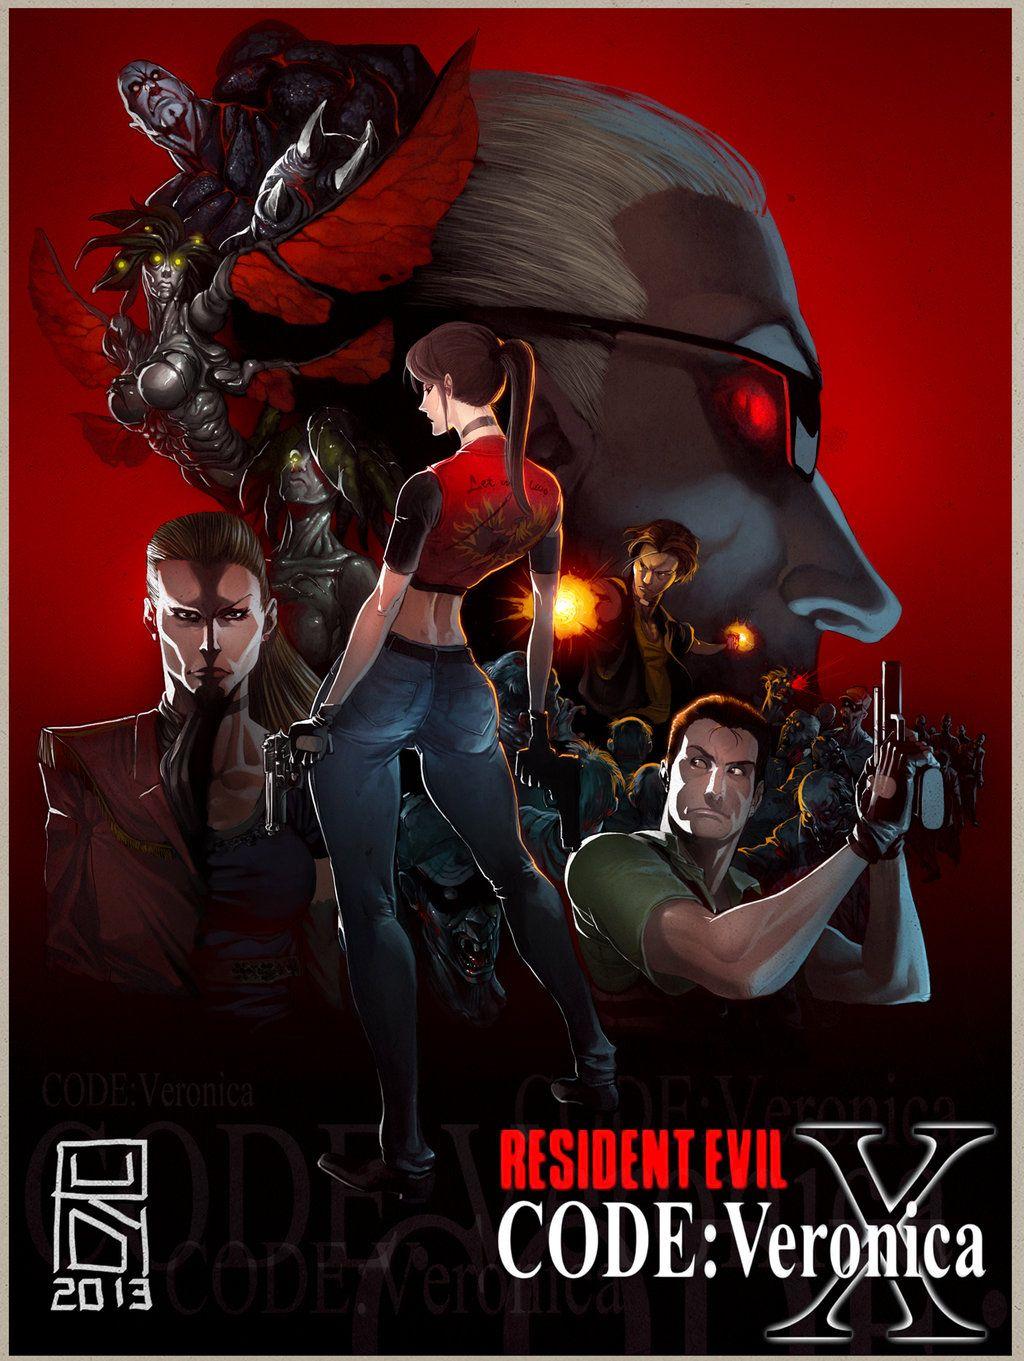 Resident Evil Code Veronica by Darkdux on deviantART